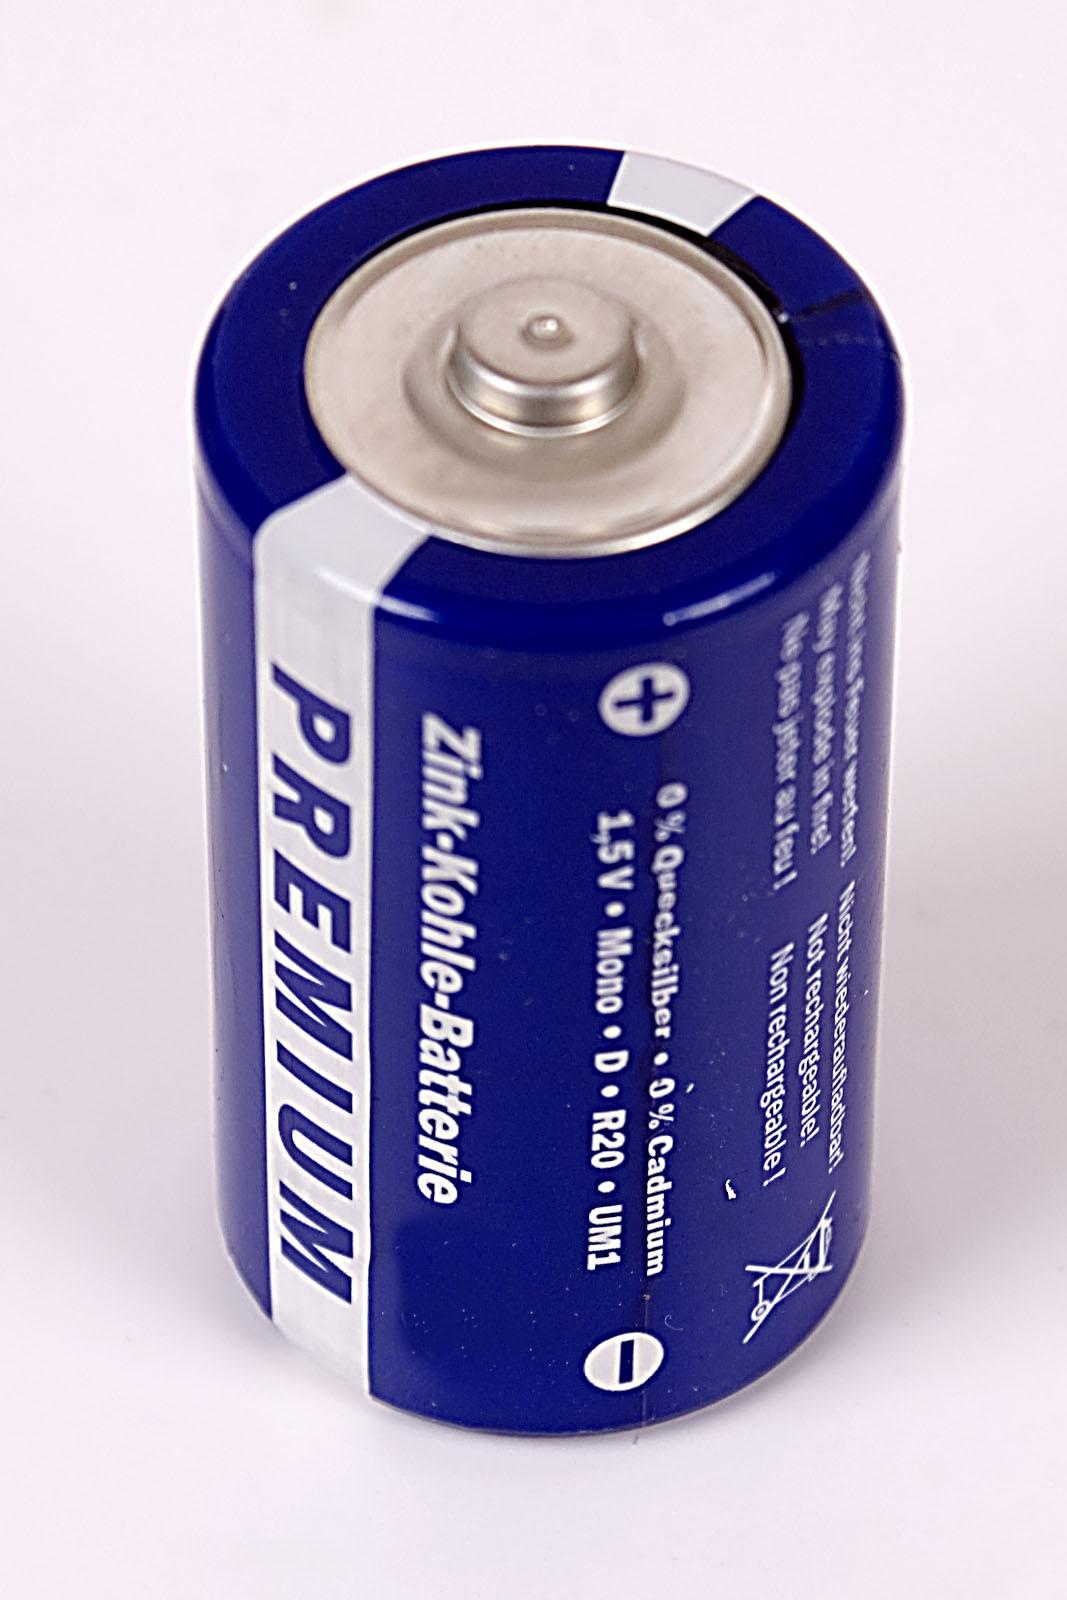 D Battery Wikipedia Baterai Recharge Sony Aaa